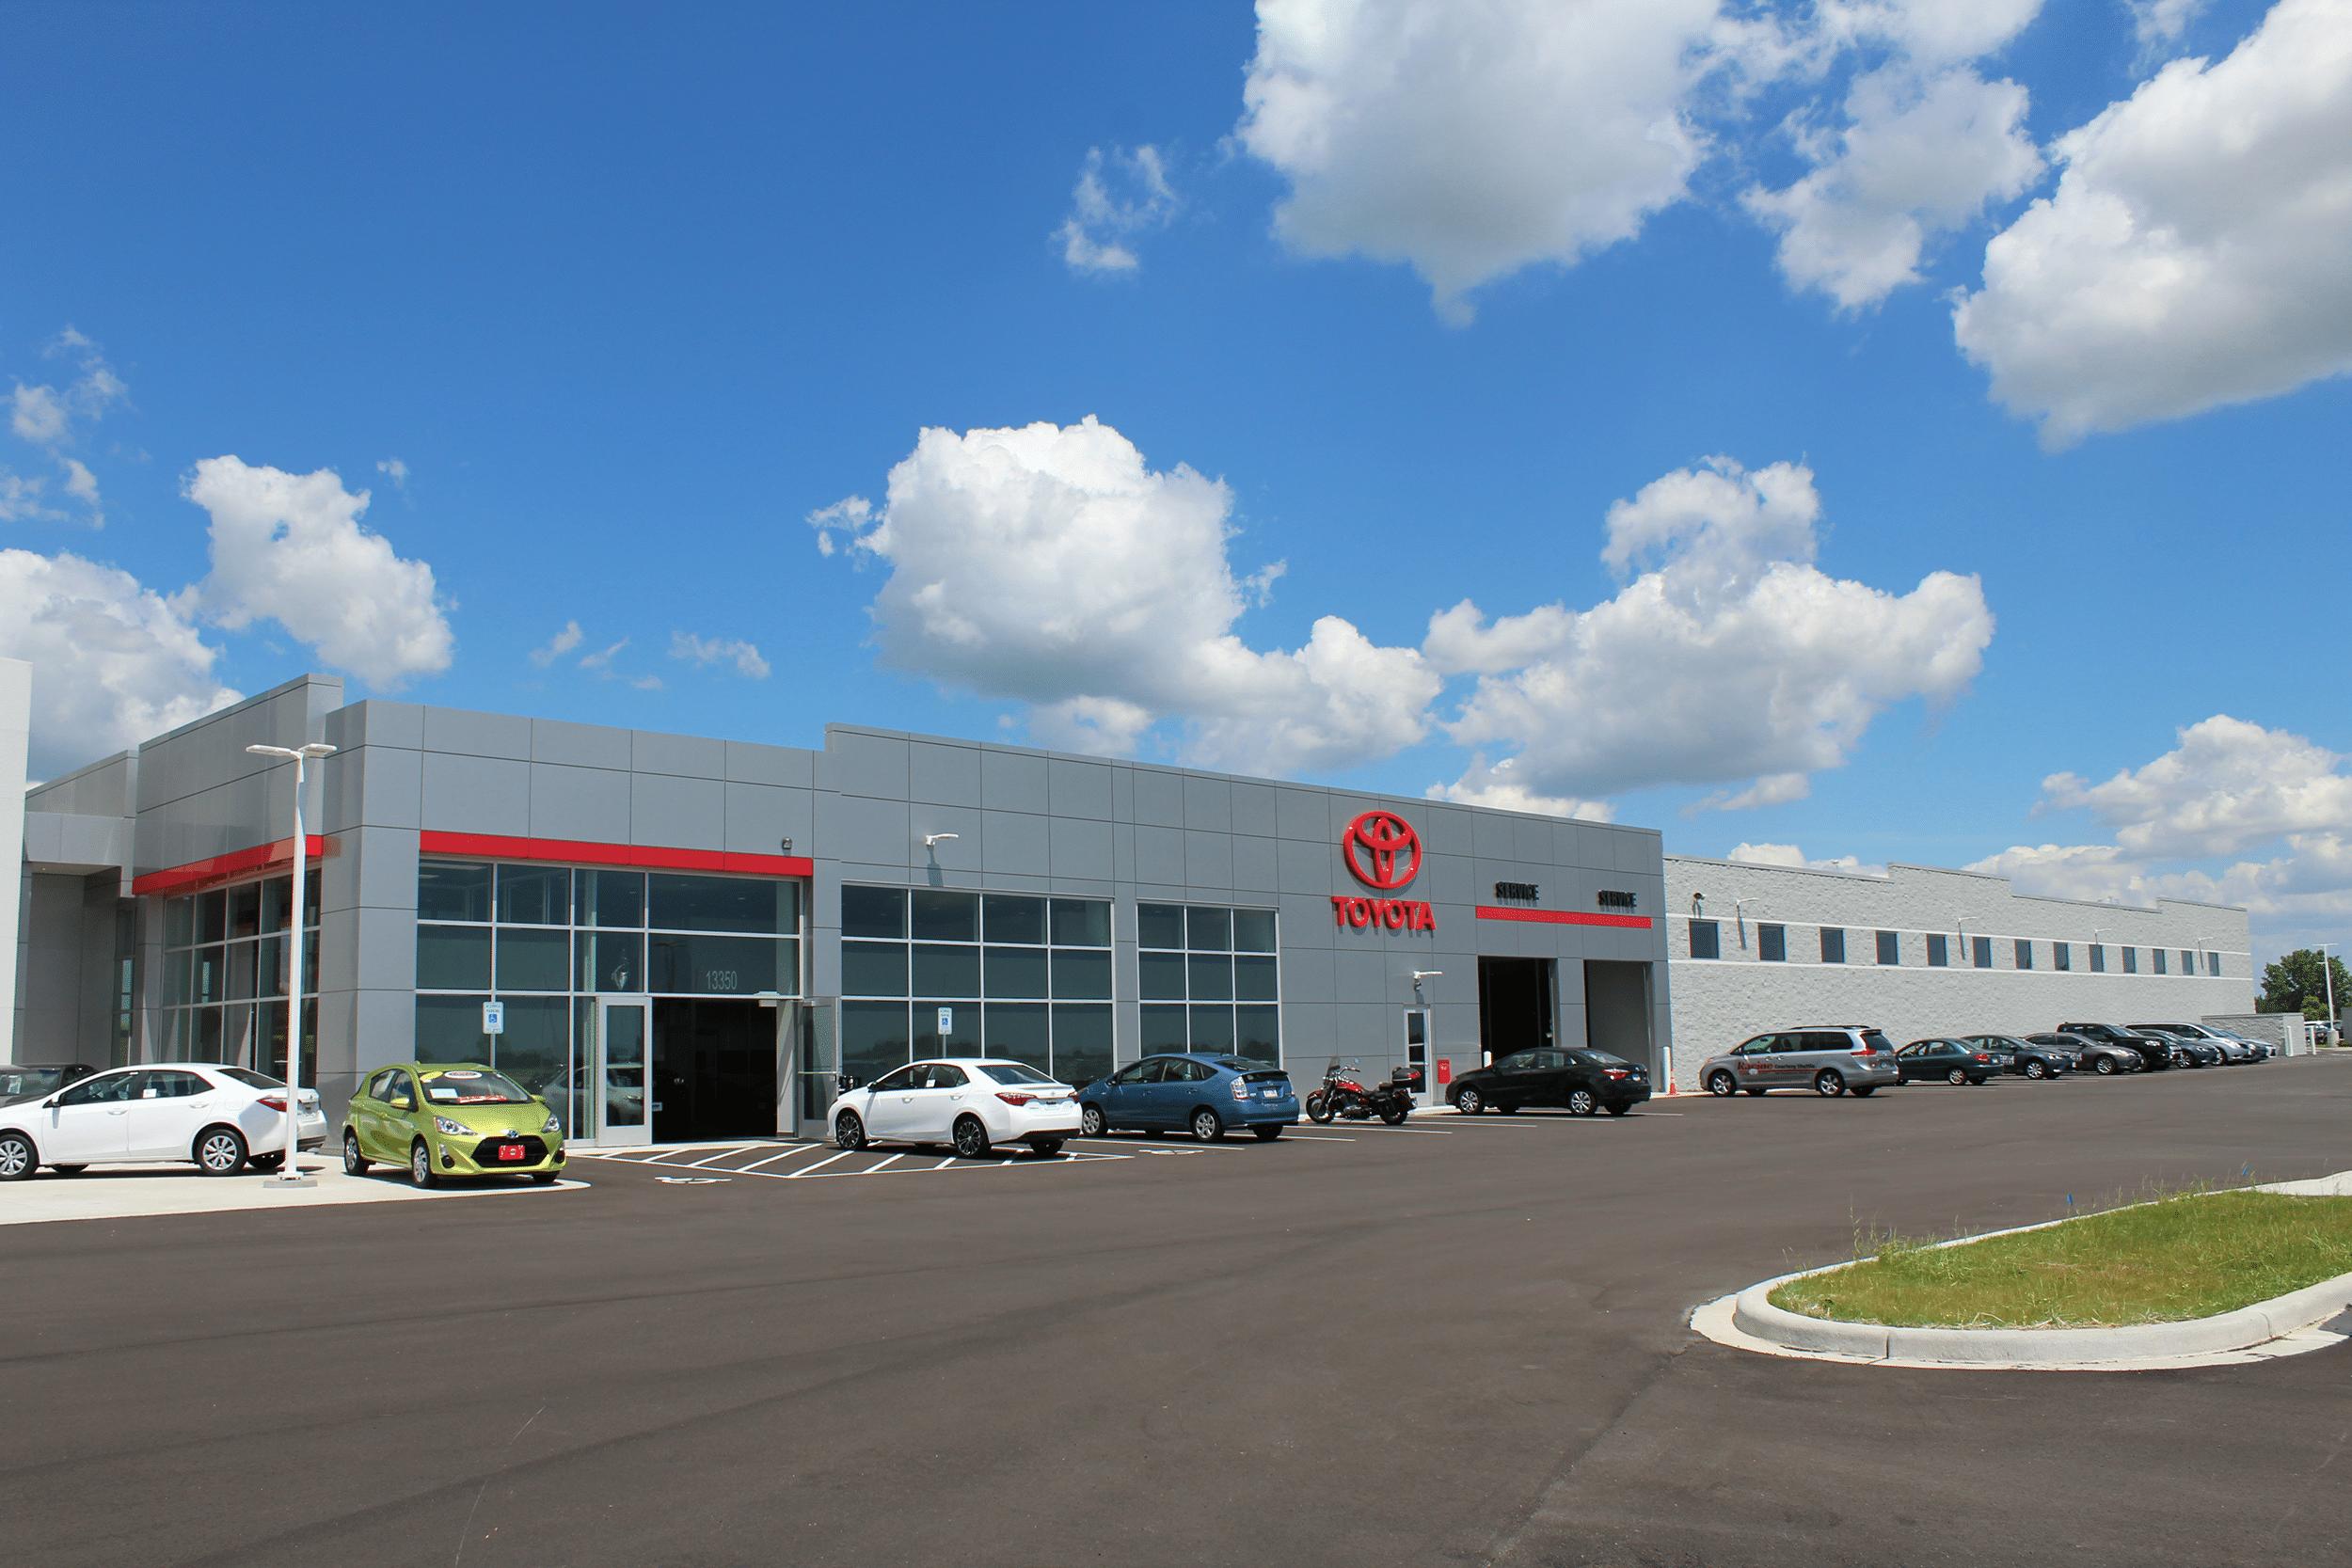 Side view of Racine Toyota car dealership